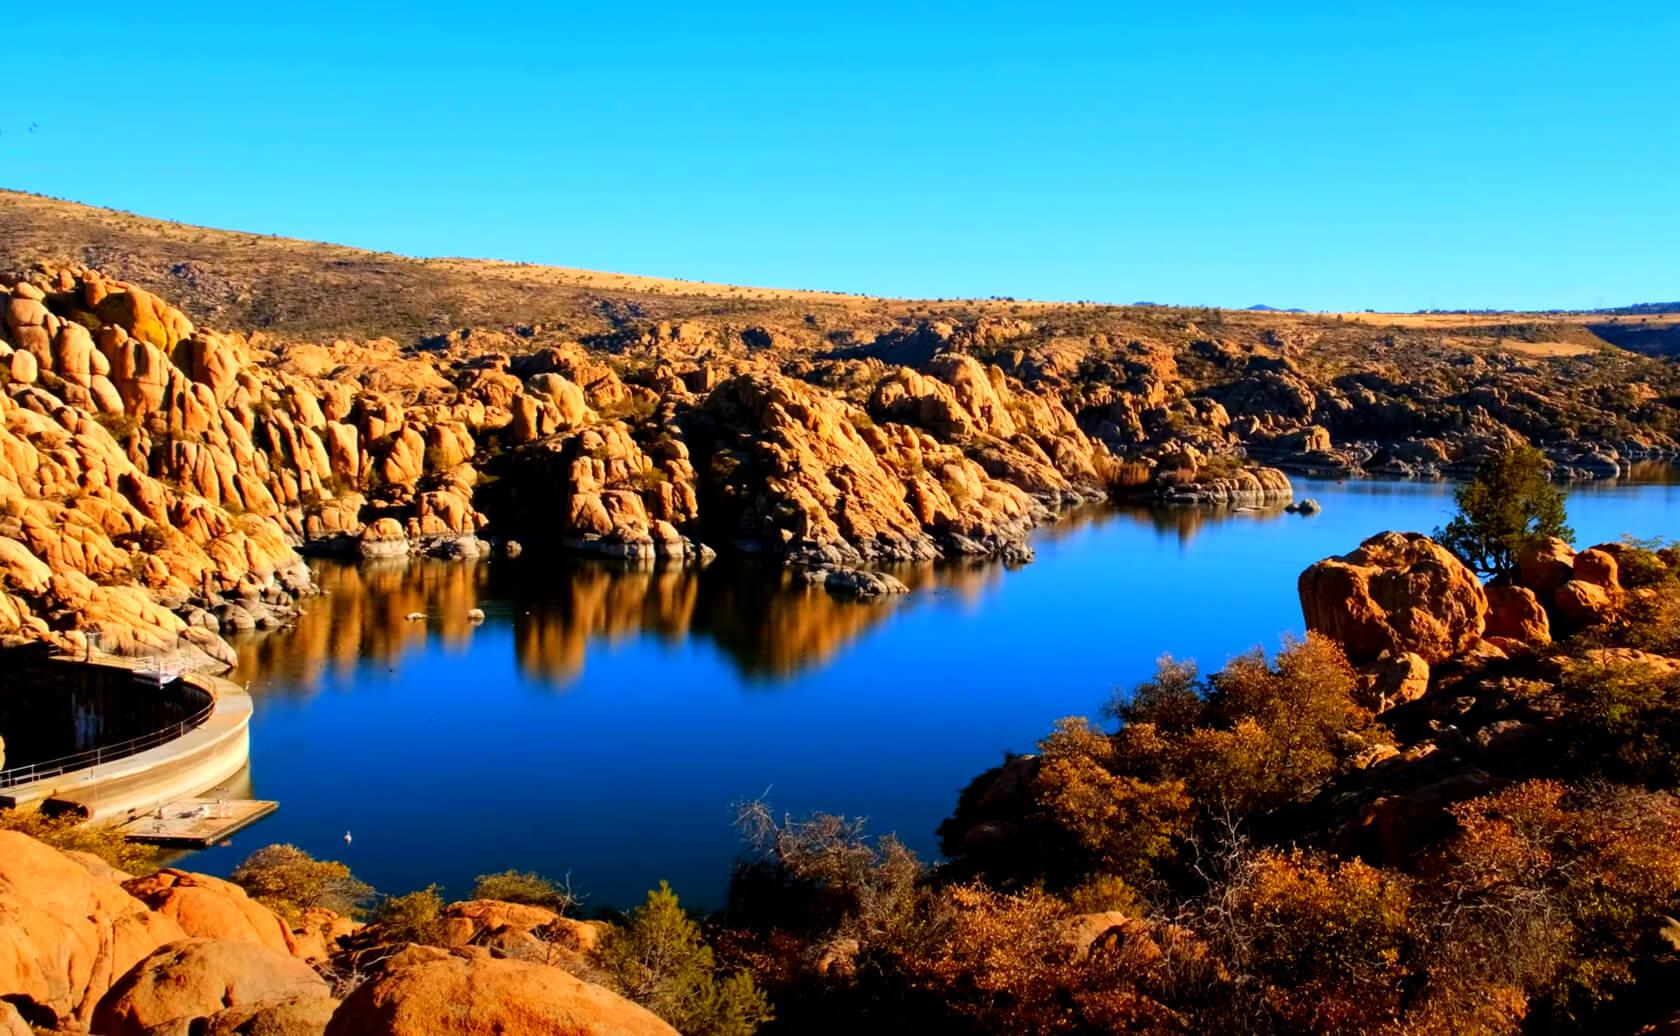 Watson-Lake-Fishing-Guide-Report-Arizona-08